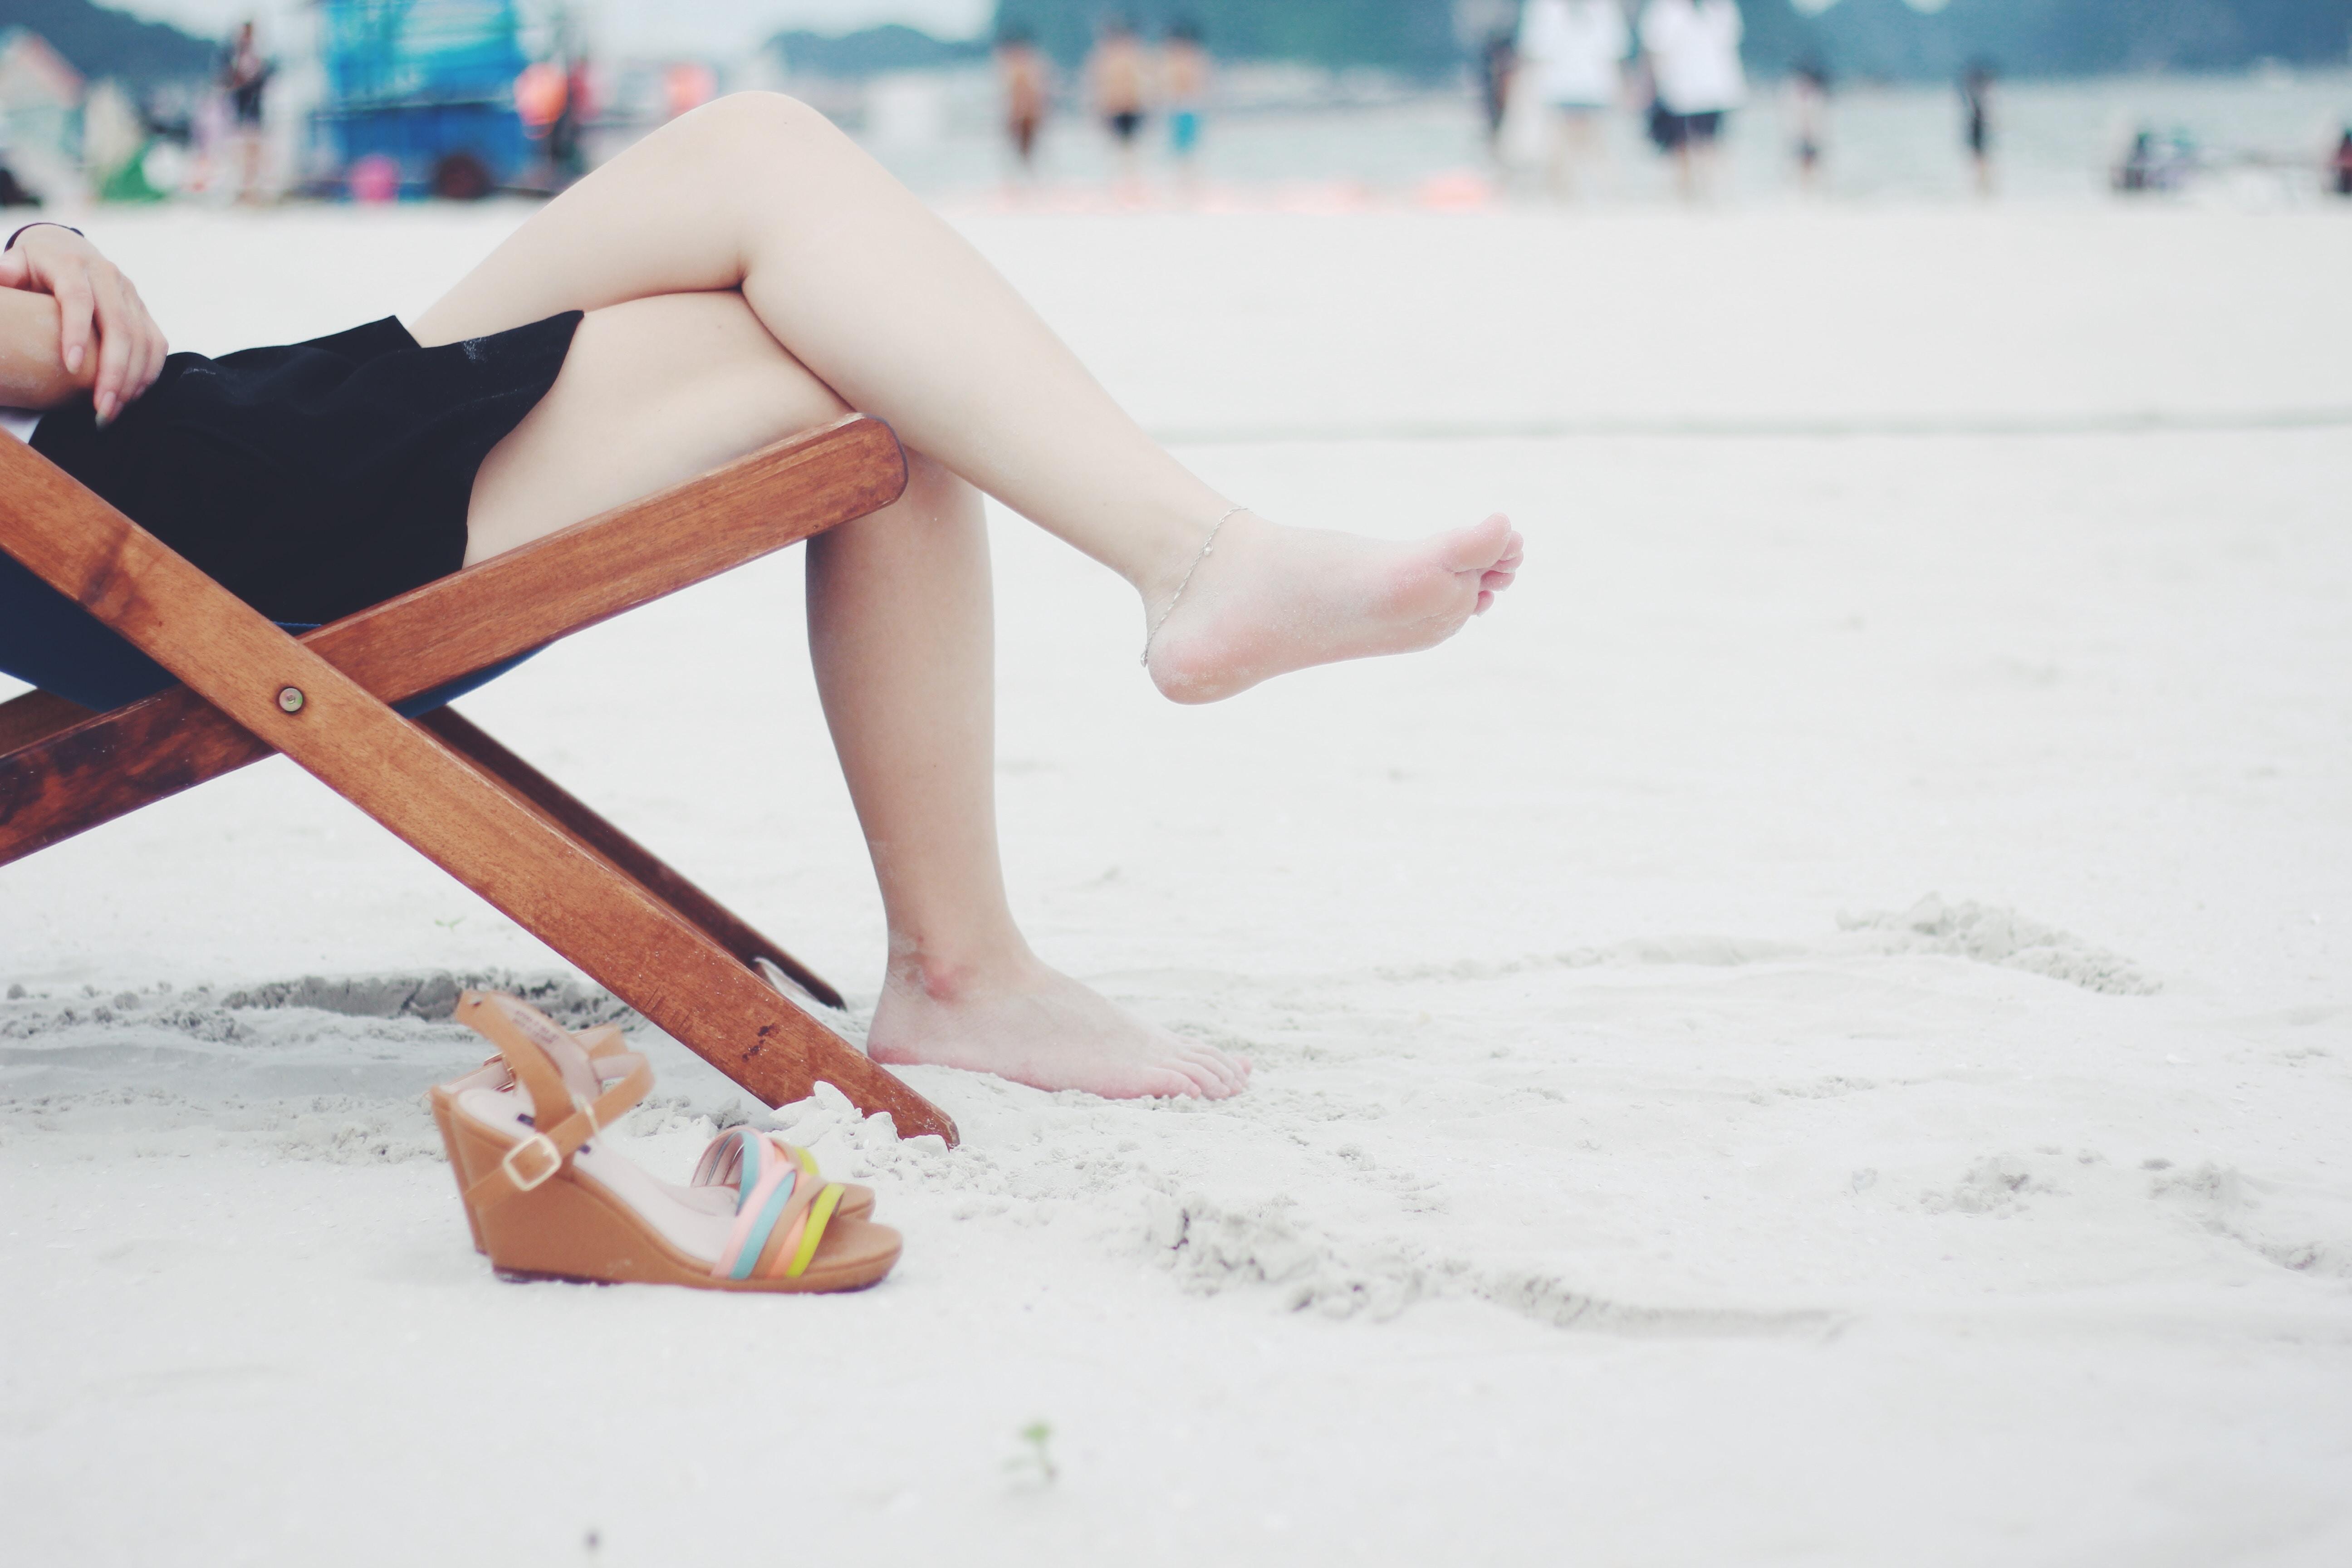 Schurende benen, zo kom je er vanaf! strand